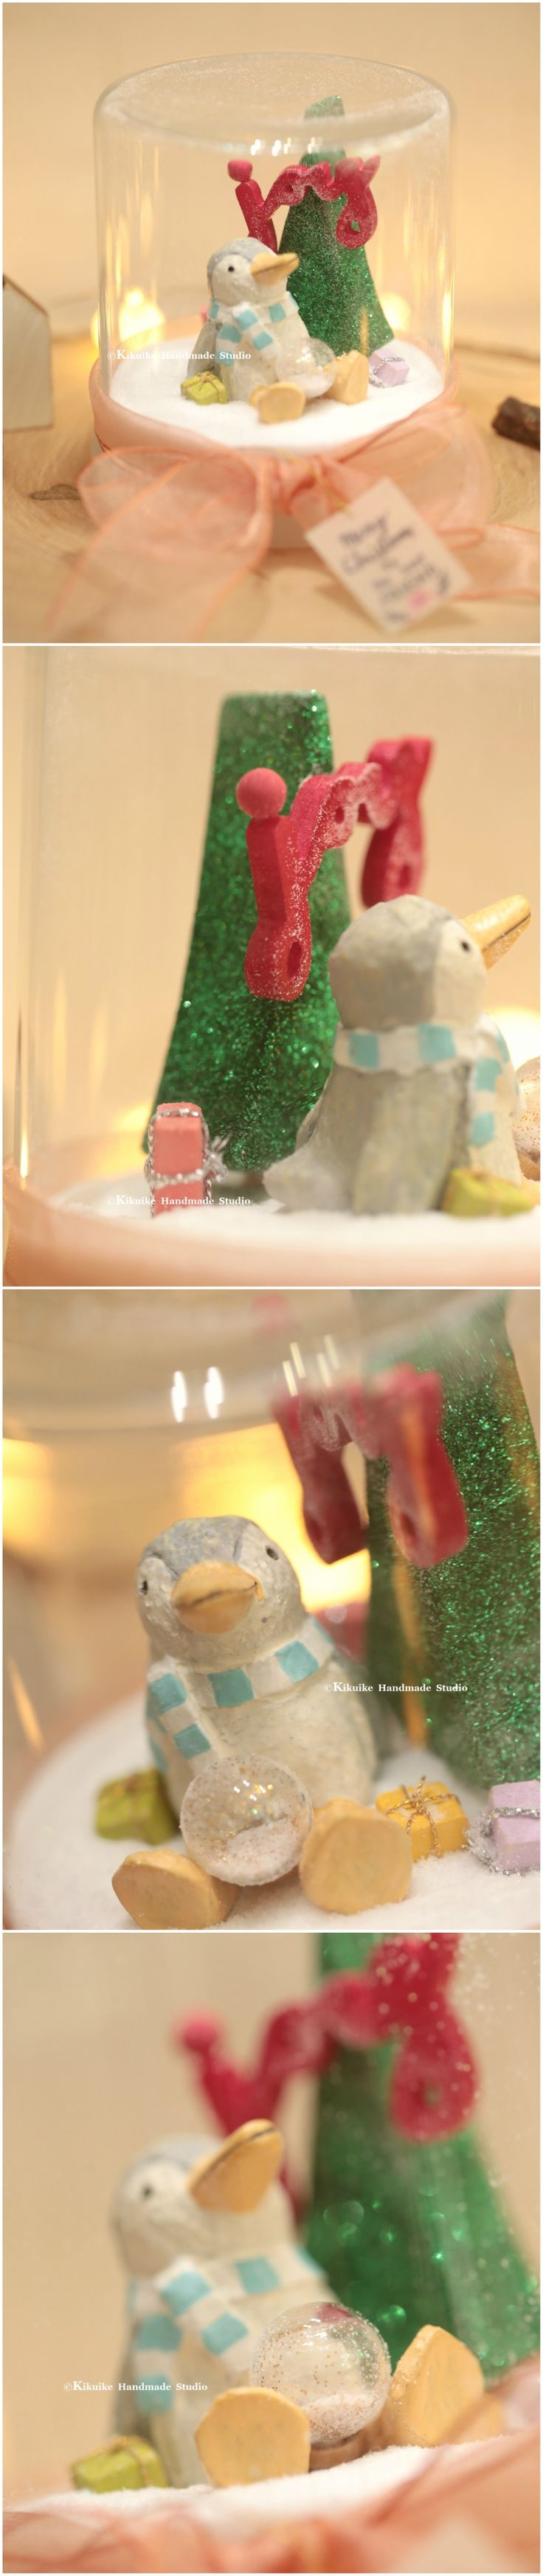 Merry Christmas,Happy Christmas,X'mas gift,Tiny message in a bottle,X'mas globe,Snow globe,Valentine Card,Gift for her/him,Girlfriend gift, cute penguin decoration and handmade gift ideas. #unique #handamdepenguin #christmascard #X'mascard #holidaycard #winter #custom #glitter #christmastree #sculpted #homedecor #deskdecor #messagecard #art #handpainted #christmasdecoration #season'sgreeting #joy #kikuikestudio #聖誕 #Noël #クリスマス #Navidad #Natale #ペンギン #Pinguin #manchot #企鵝